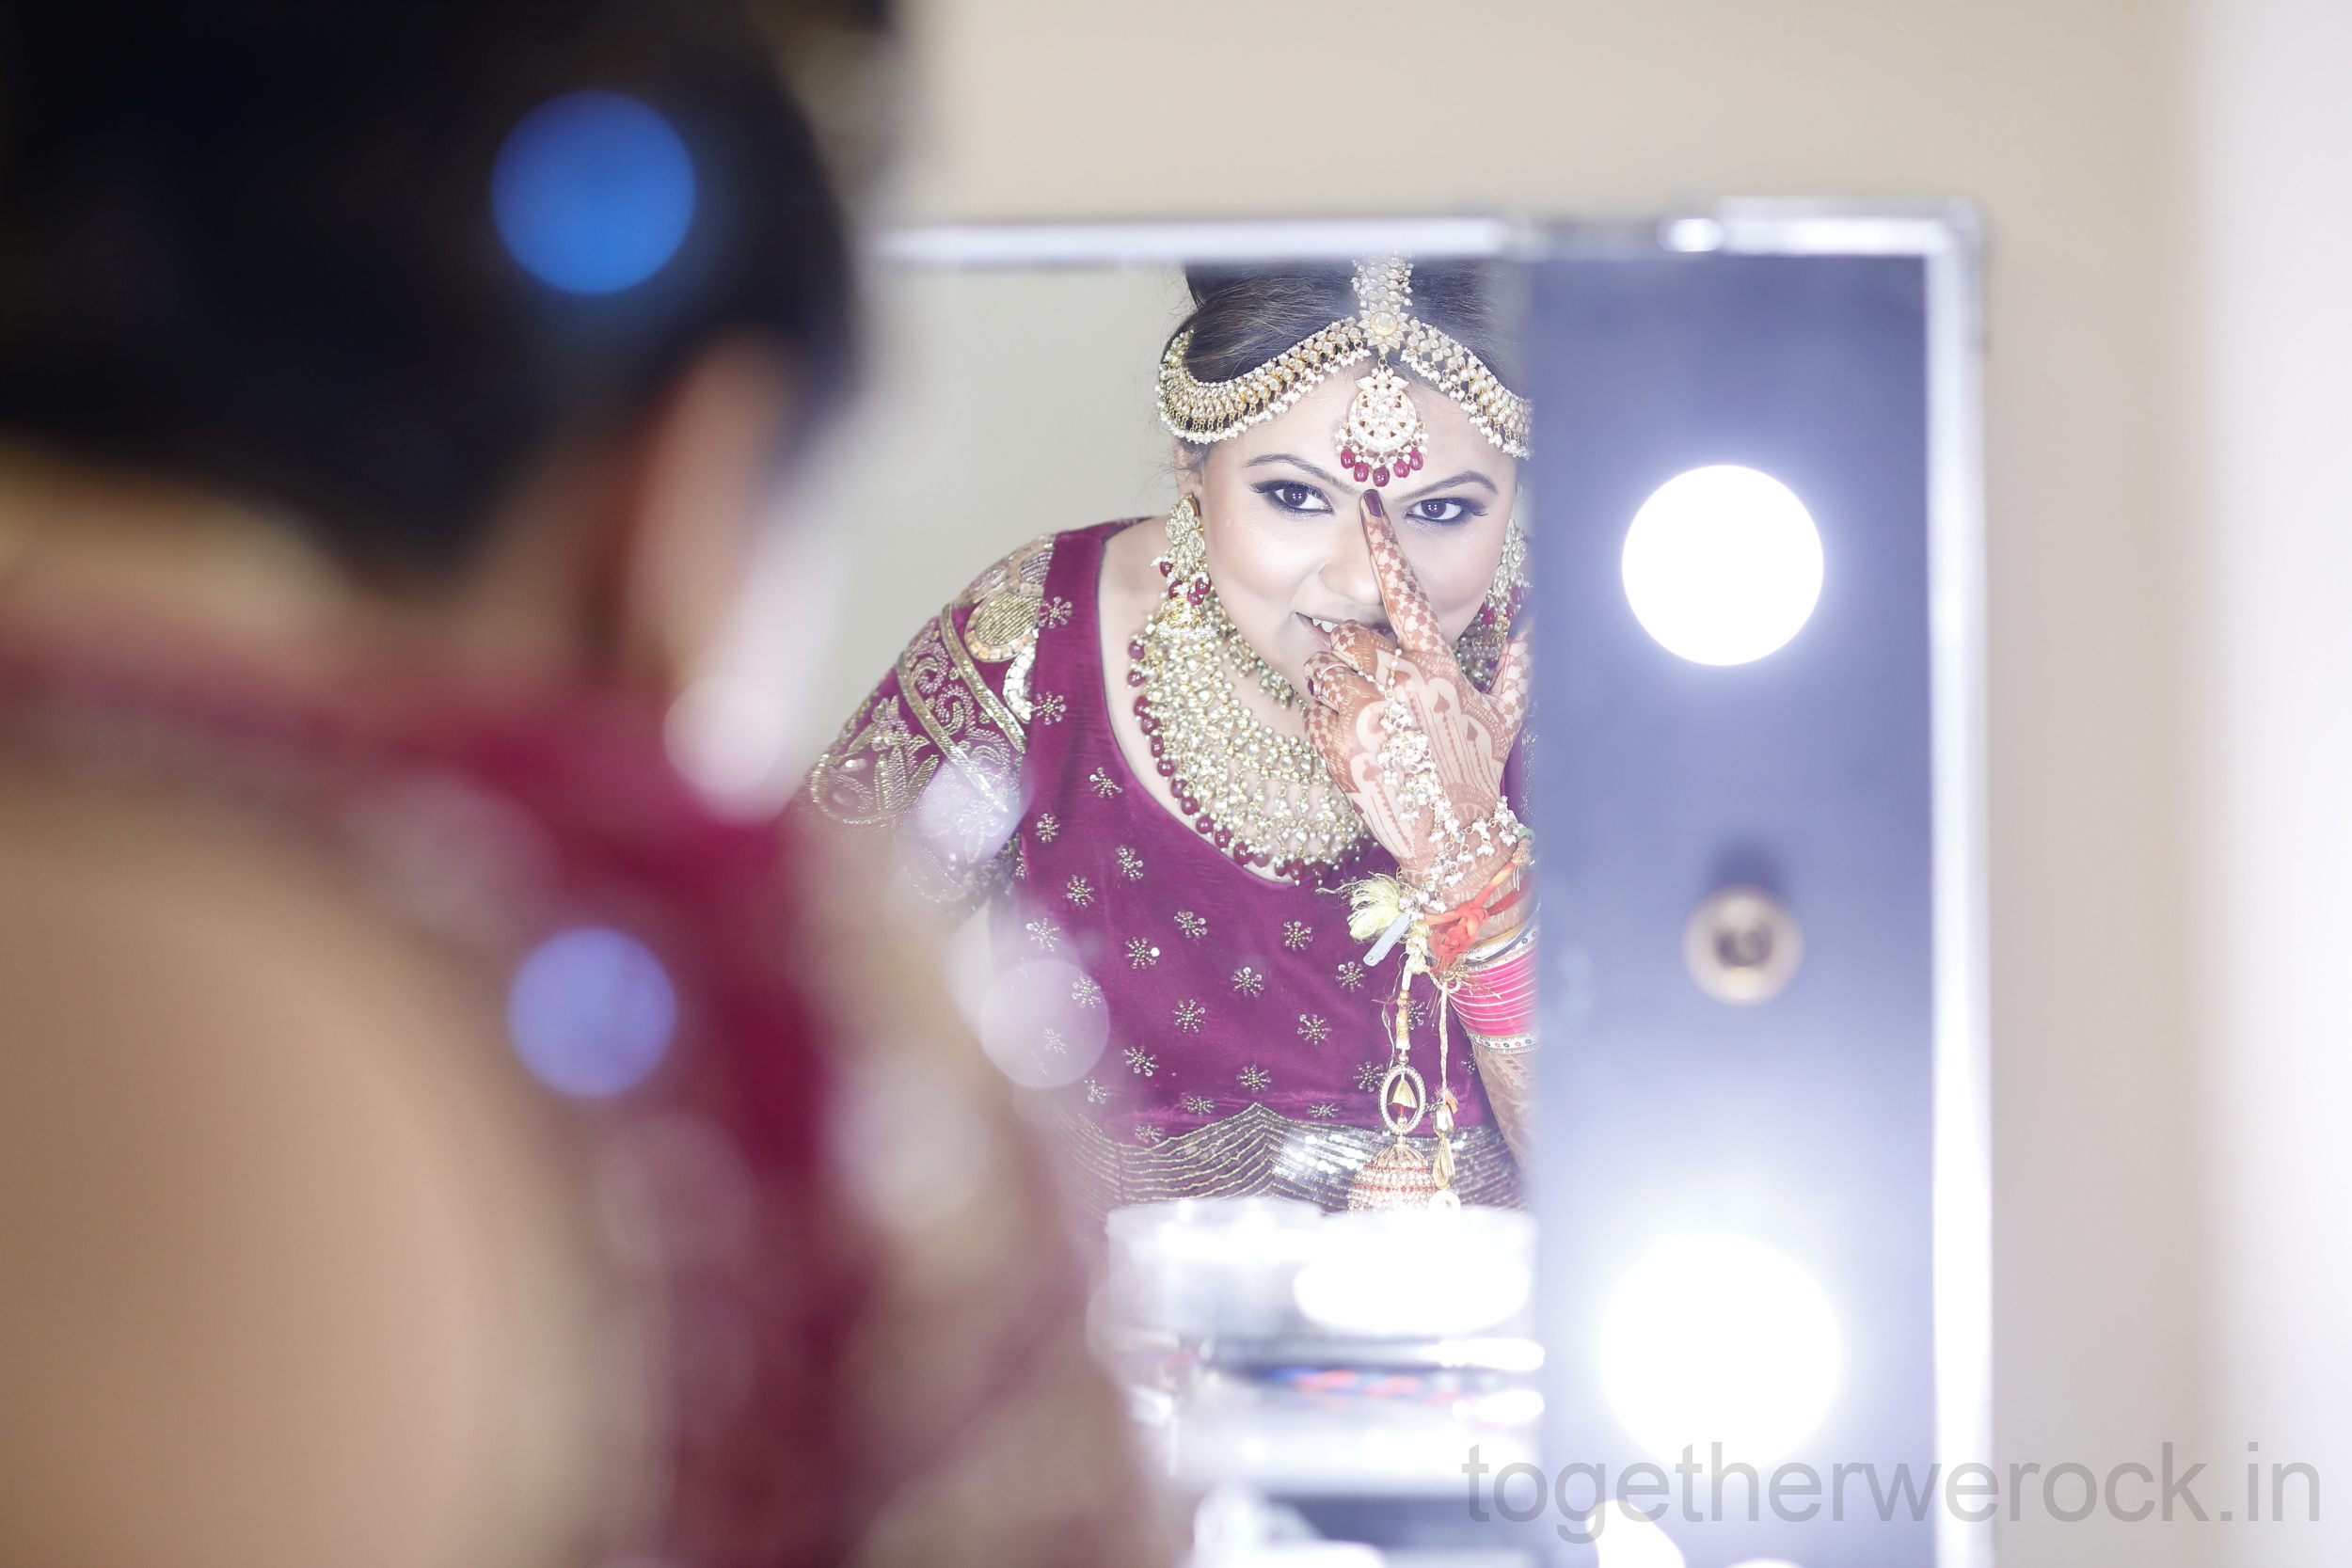 Candid wedding photographersC69A0579 Delhi